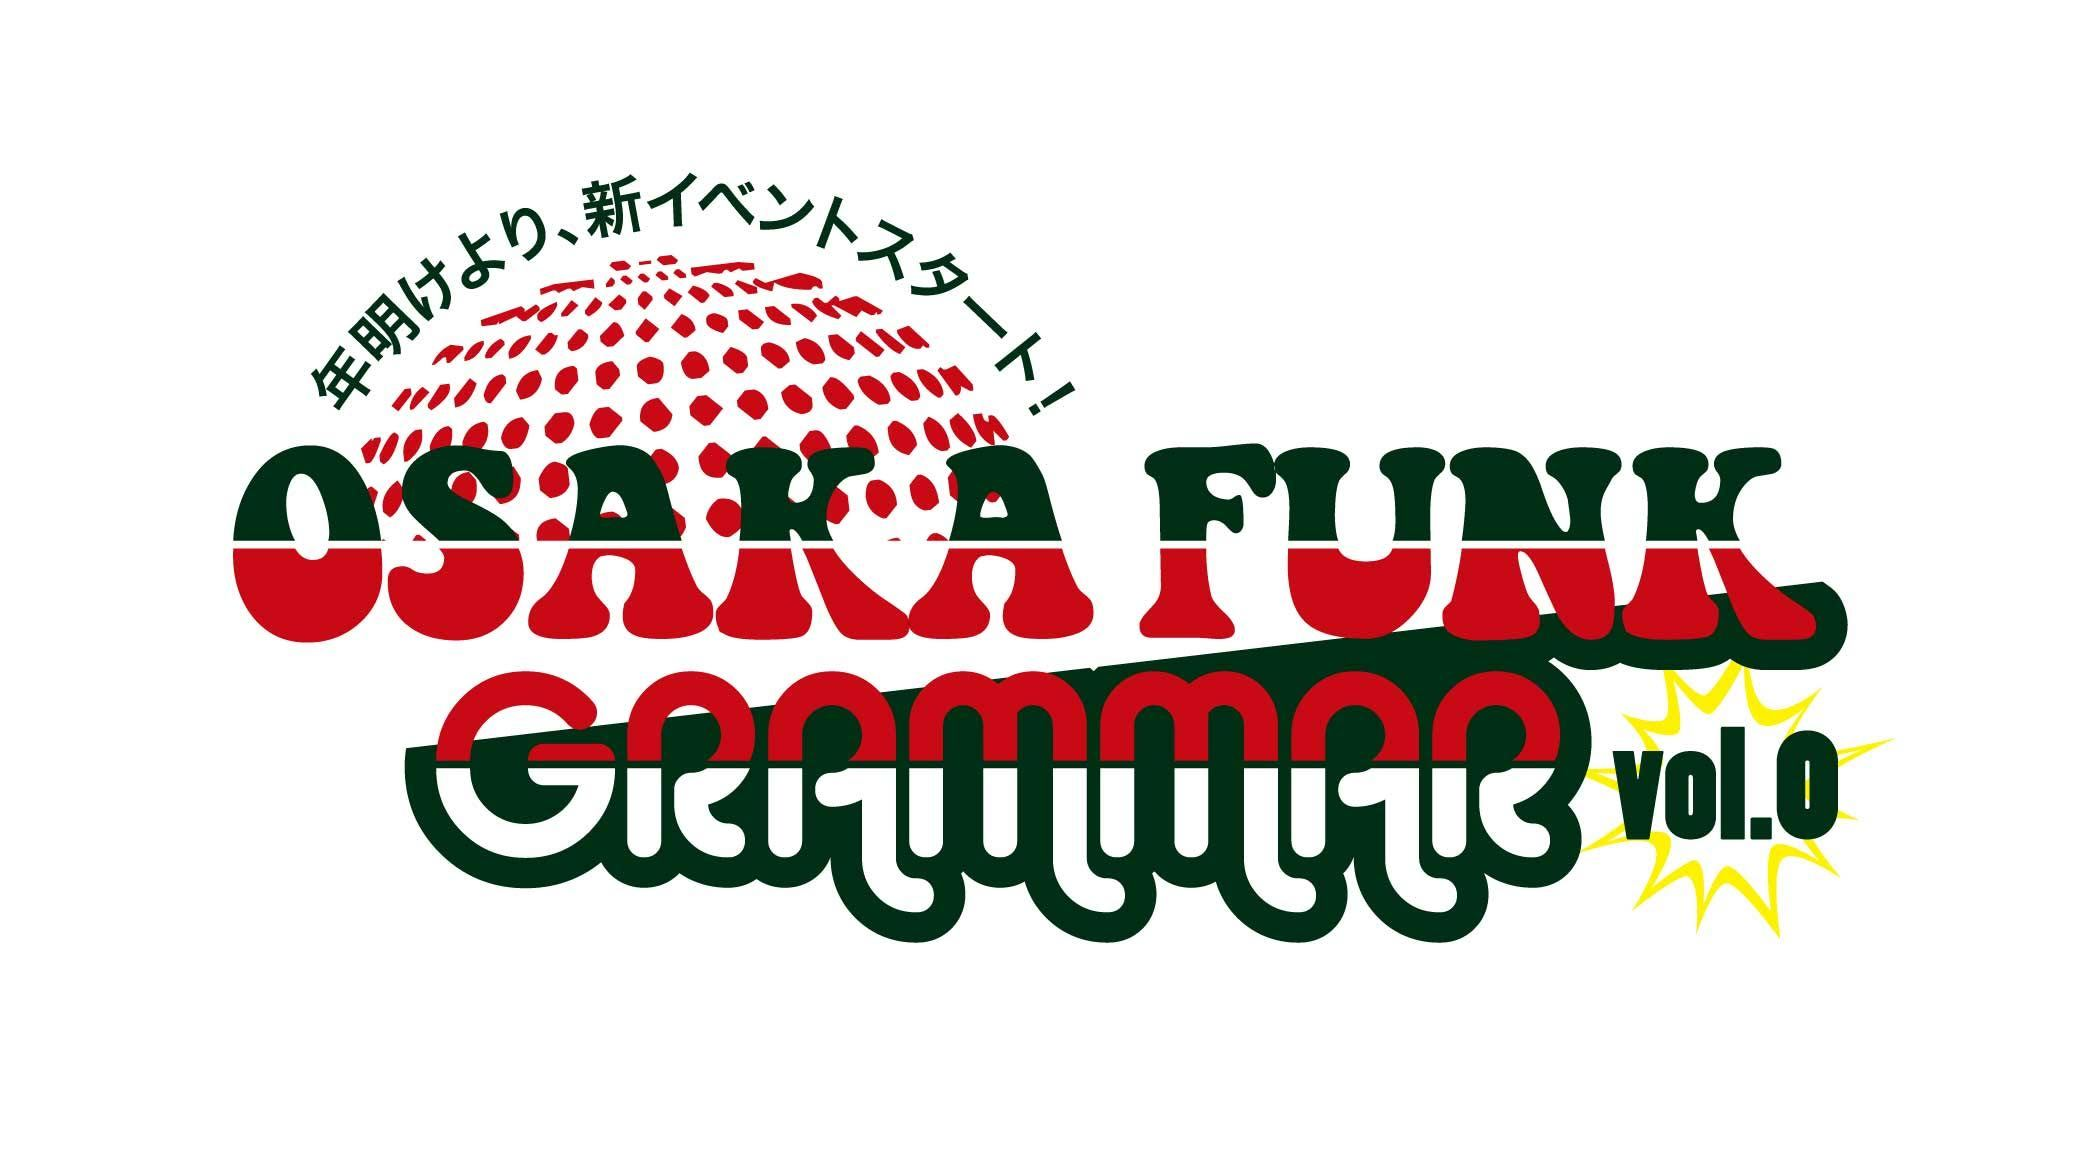 OSAKA FUNK GRAMMER vol.0